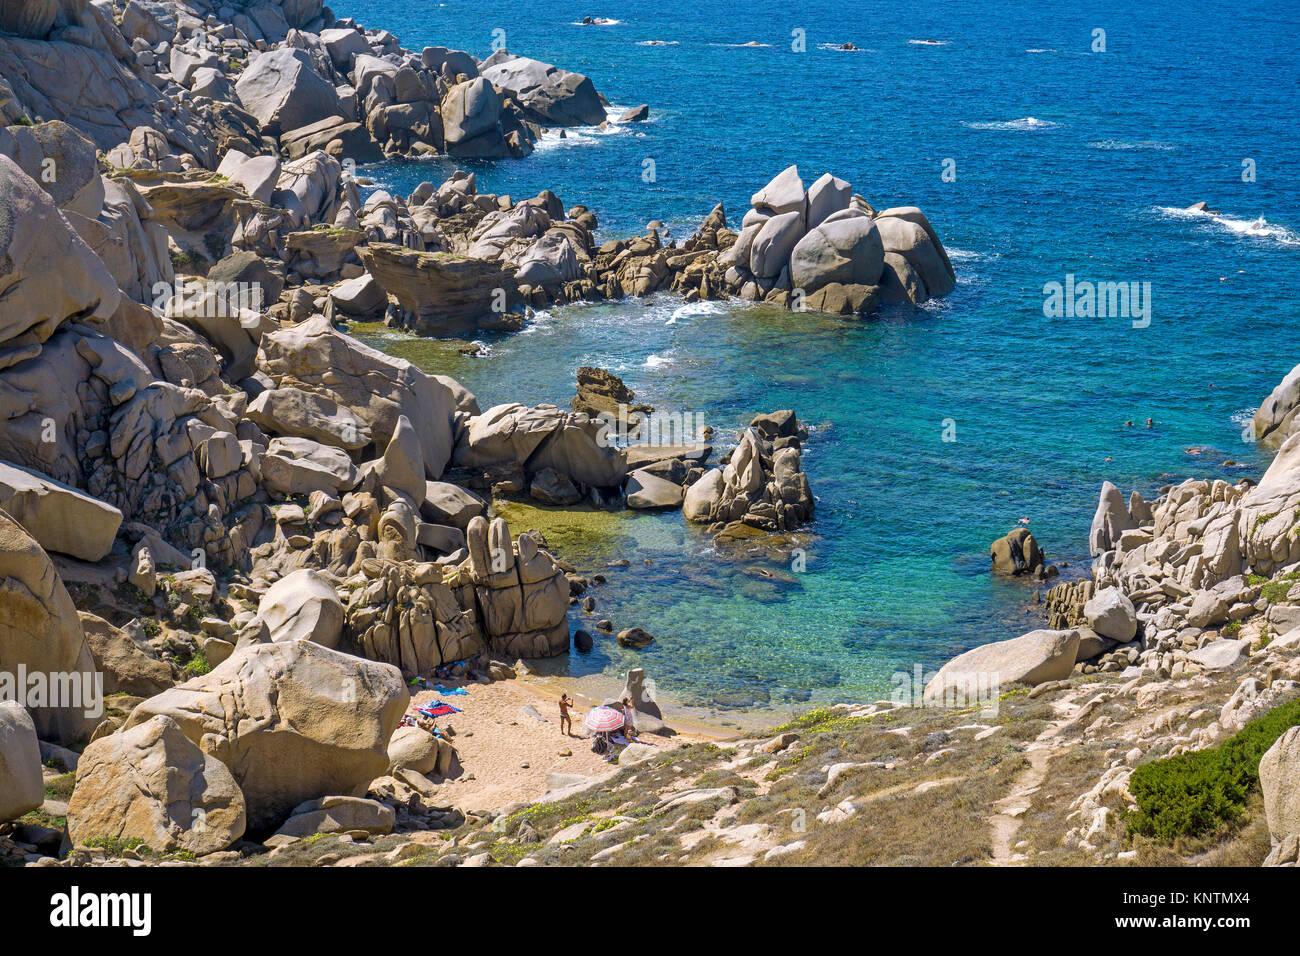 Winziger Strand umgeben von Granitfelsen am Capo Testa, Santa Teresa di Gallura, Sardinien, Italien, Mittelmeer, Stockbild